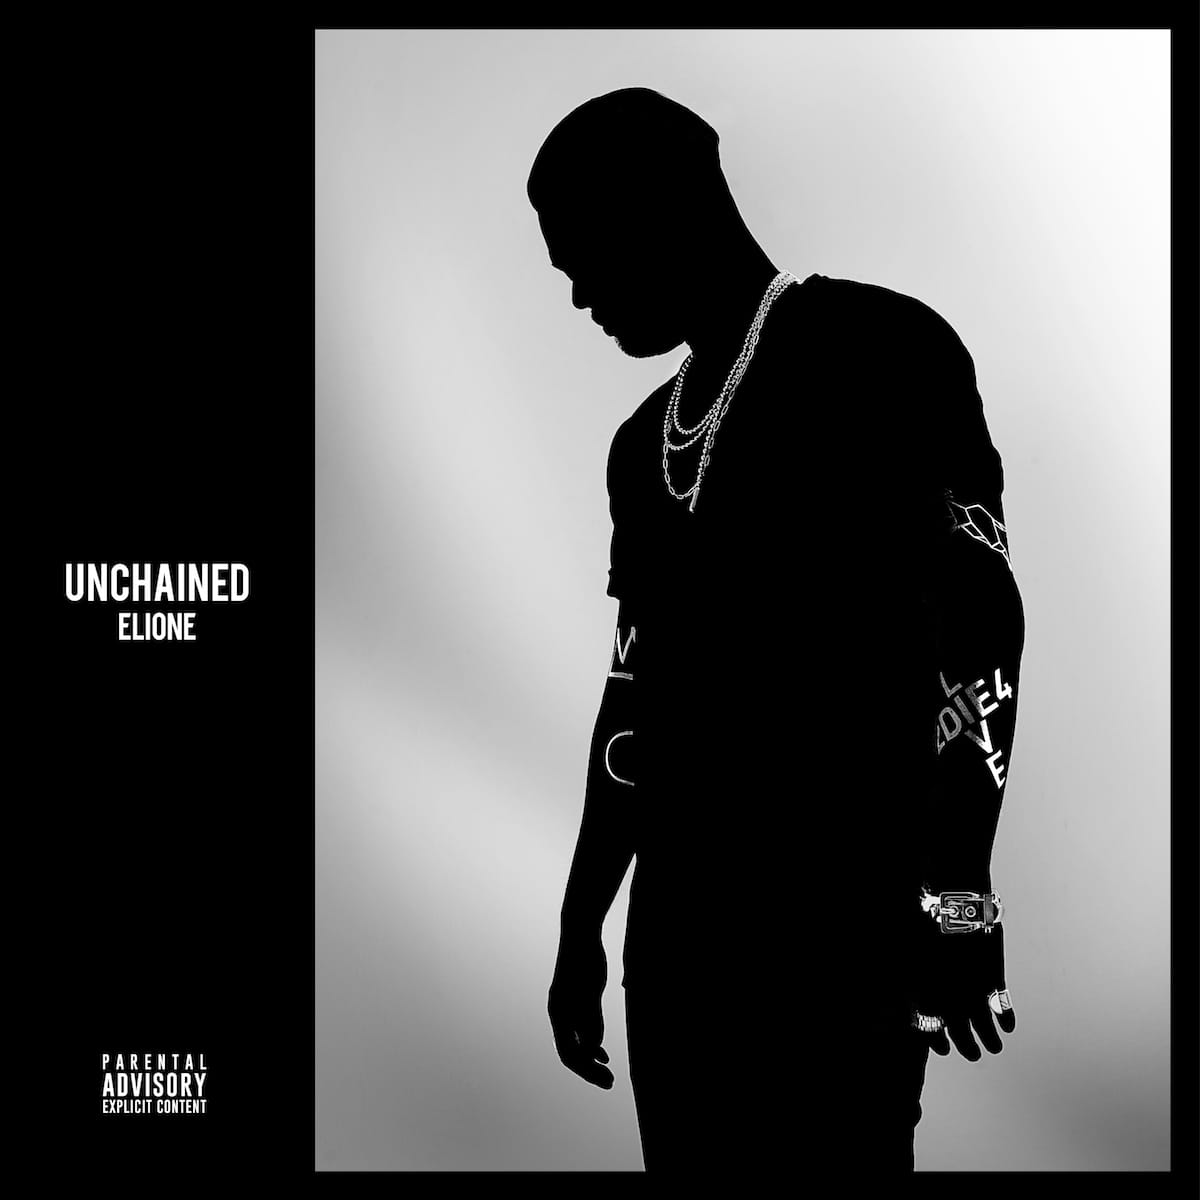 ELIONEの新作アルバム『UNCHAINED』がリリース!ELIONE × RYKEYインタビュー映像も公開! music180516_elione_4-1200x1200